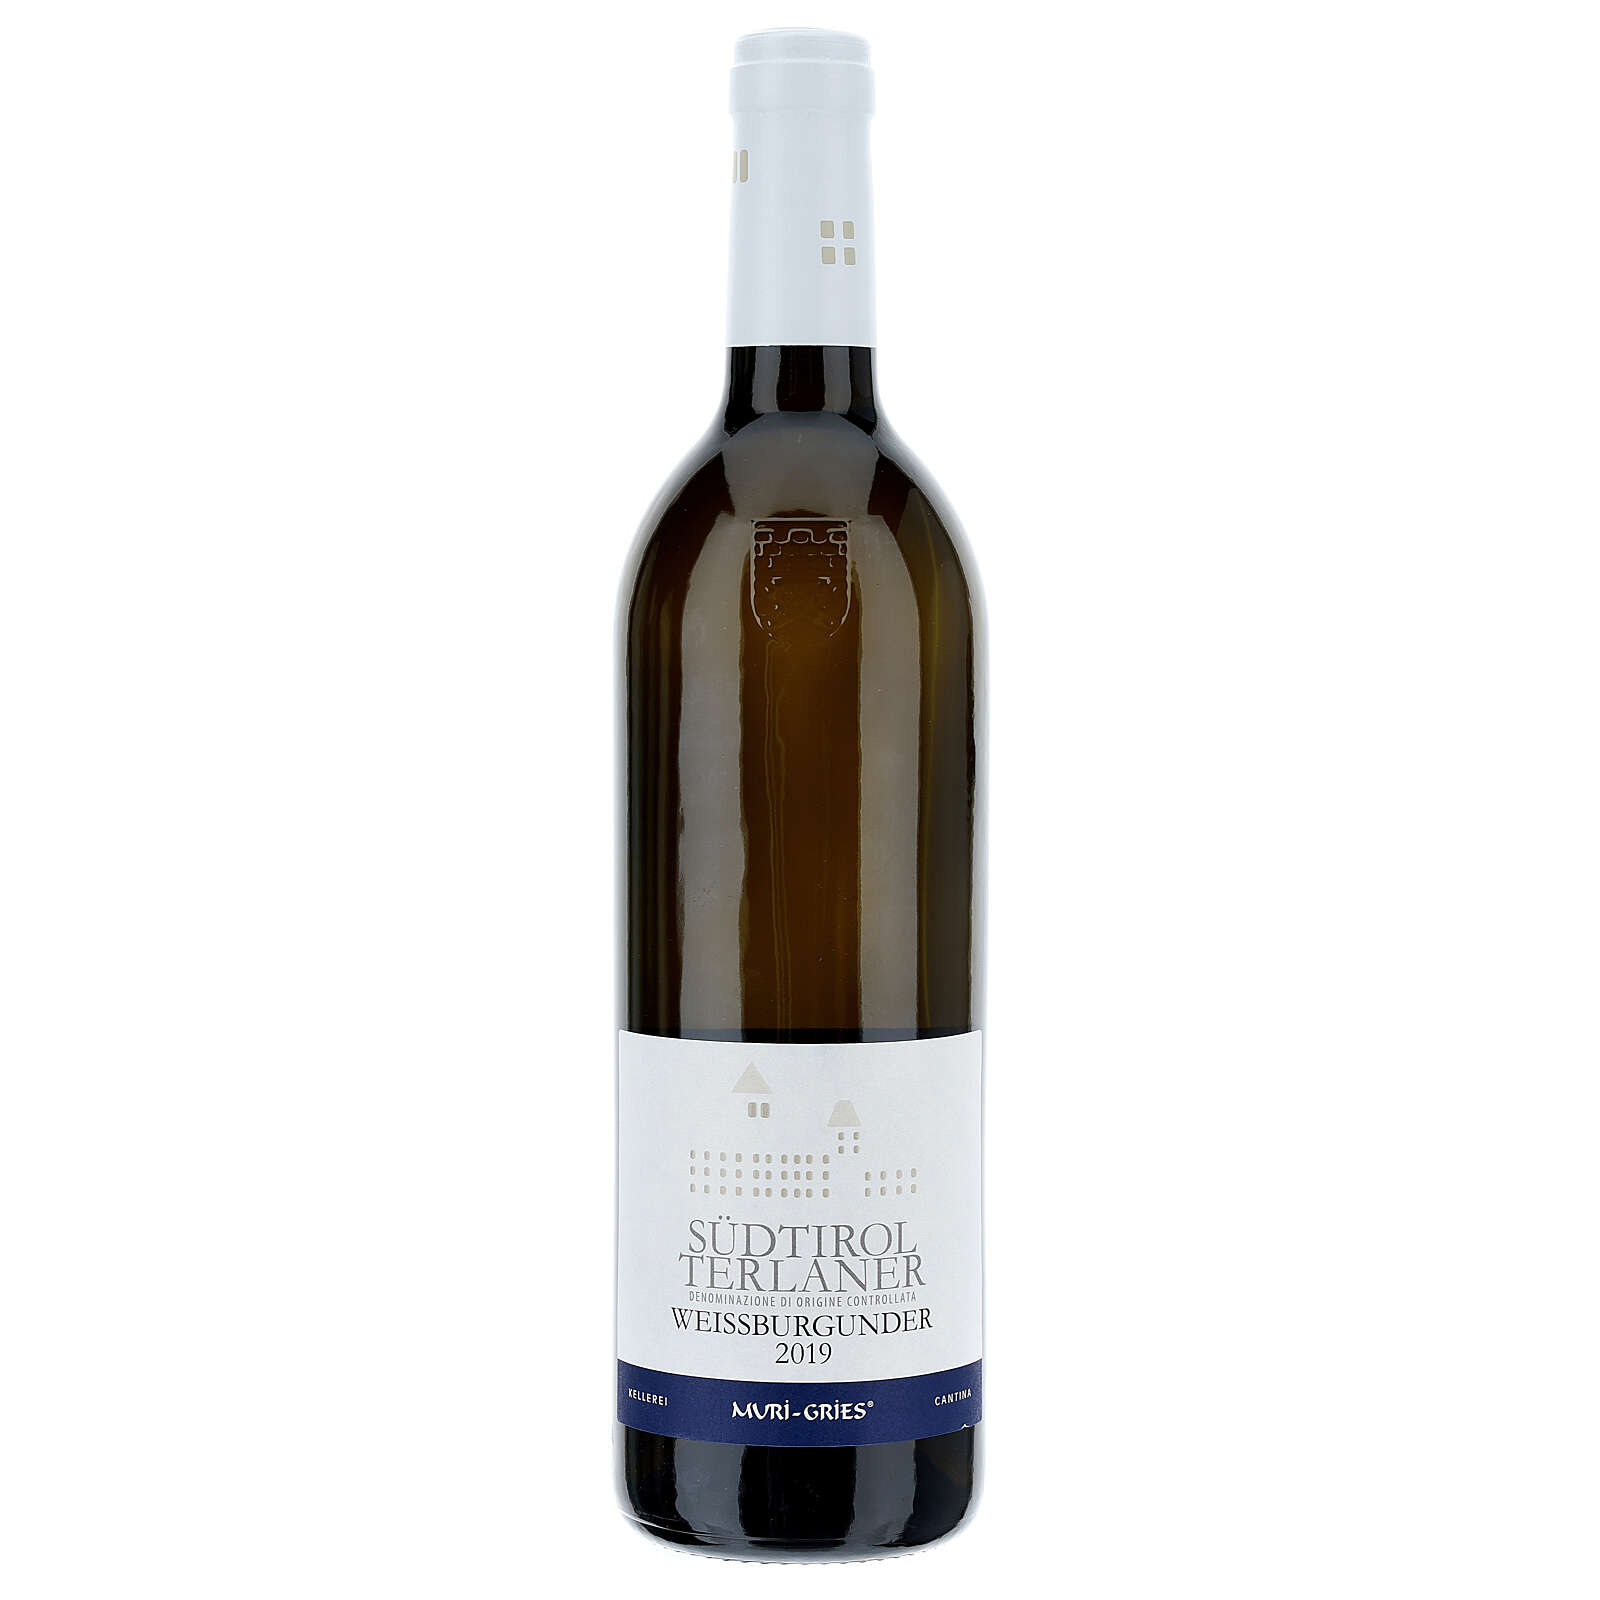 Vino Pinot Blanco de Terlano DOC 2019 Abadía Muri Gries 3